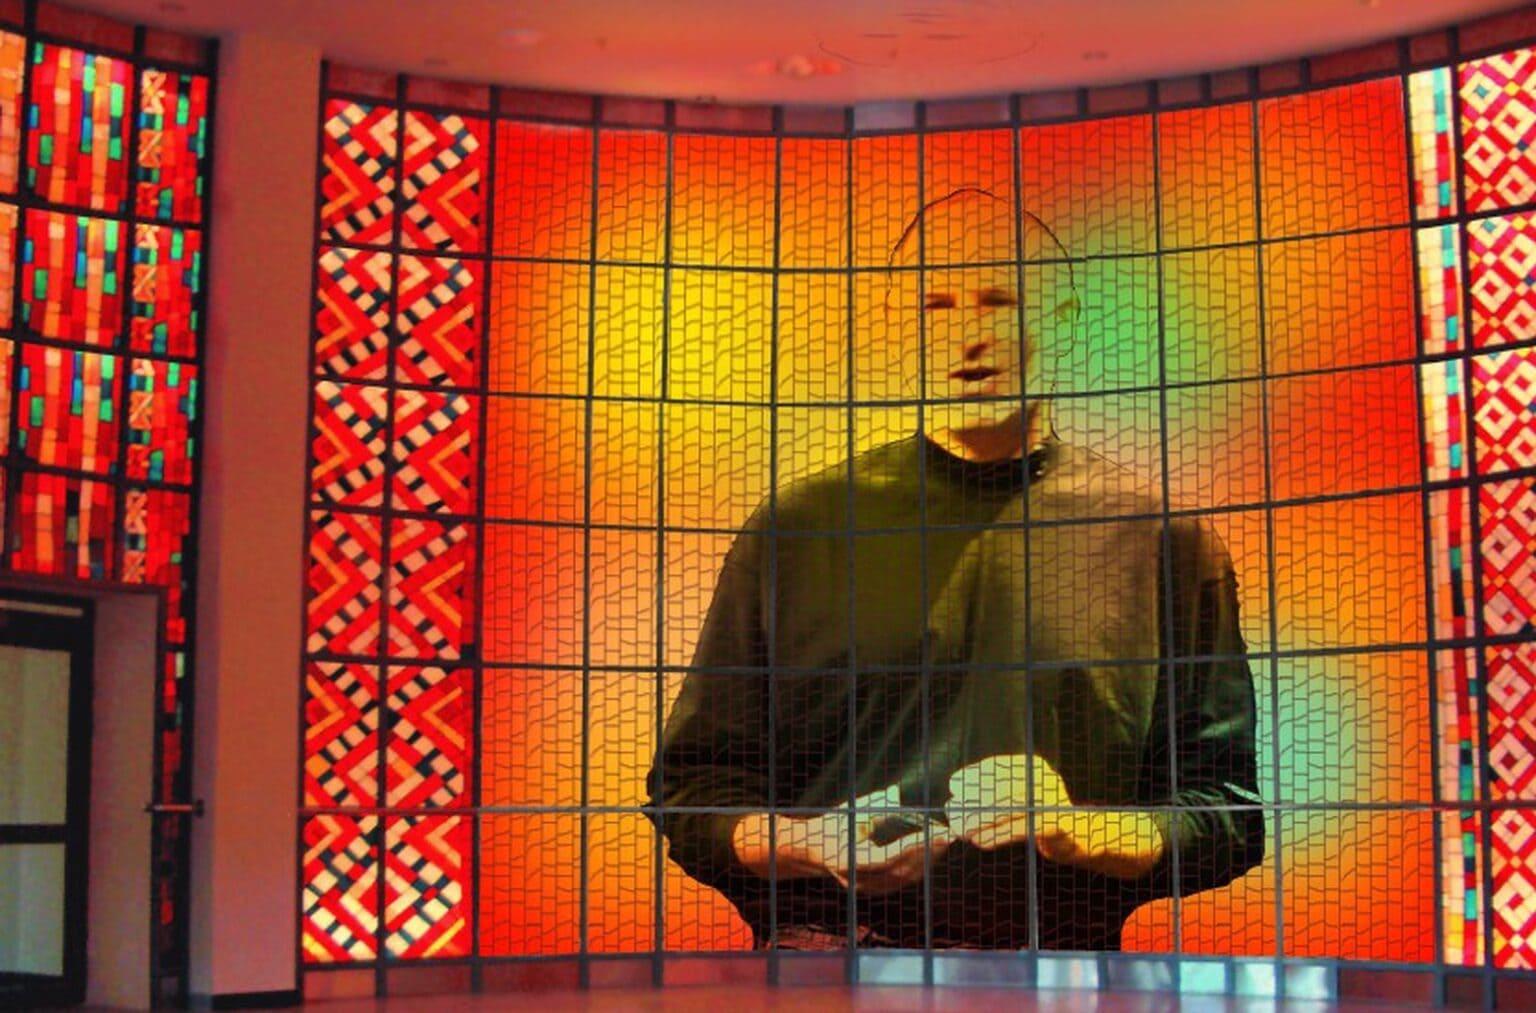 Let's close the doors on the Church of Steve Jobs